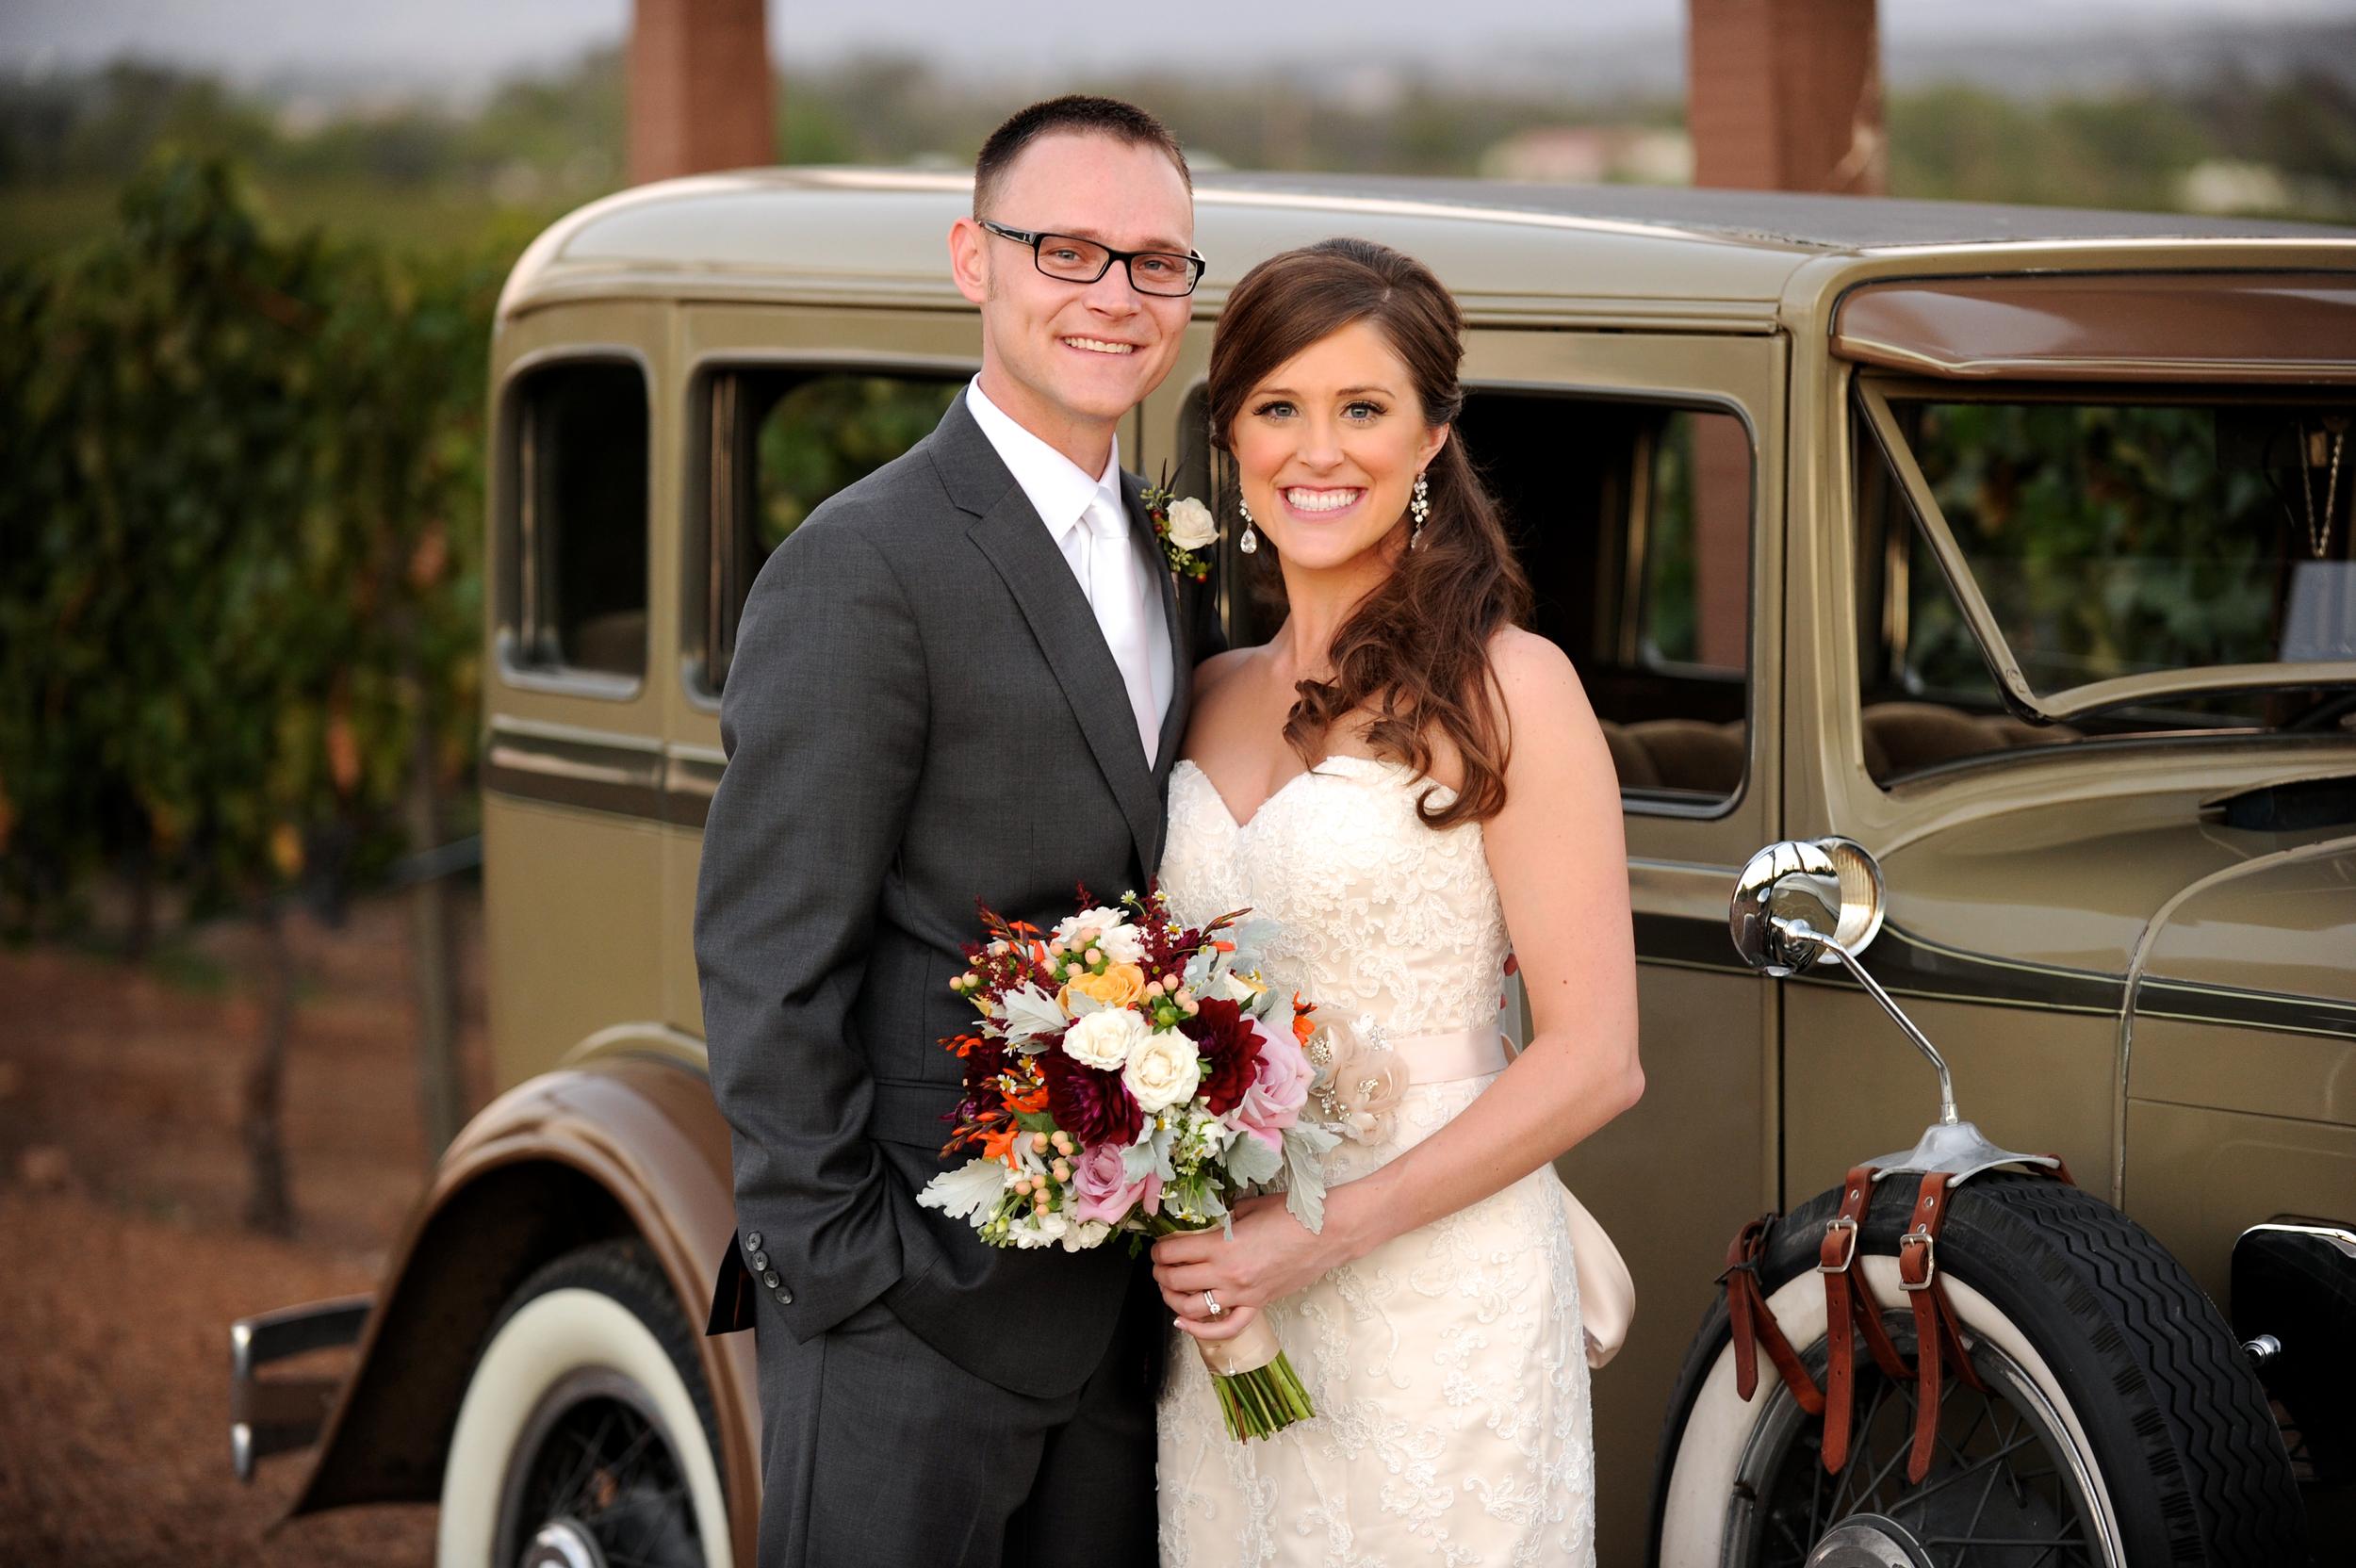 Temecula Wedding Hair and Makeup   Wilson Creek Winery Wedding   Southern California Wedding